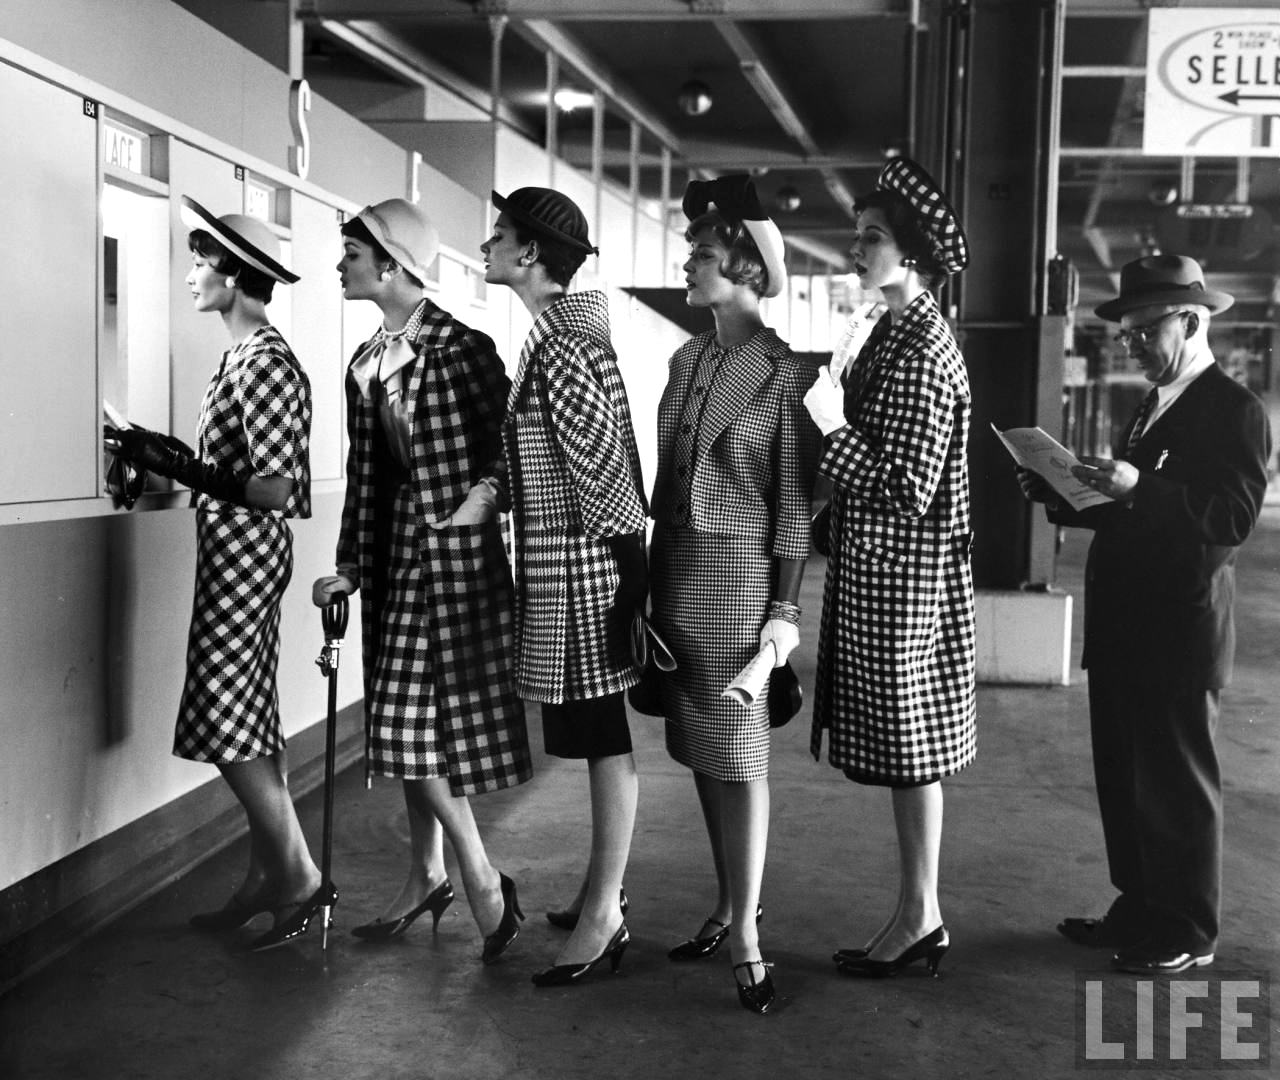 Fotó: Nina Leen: Roosevelt Raceway. 1958 © Nina Leen/Life Magazine